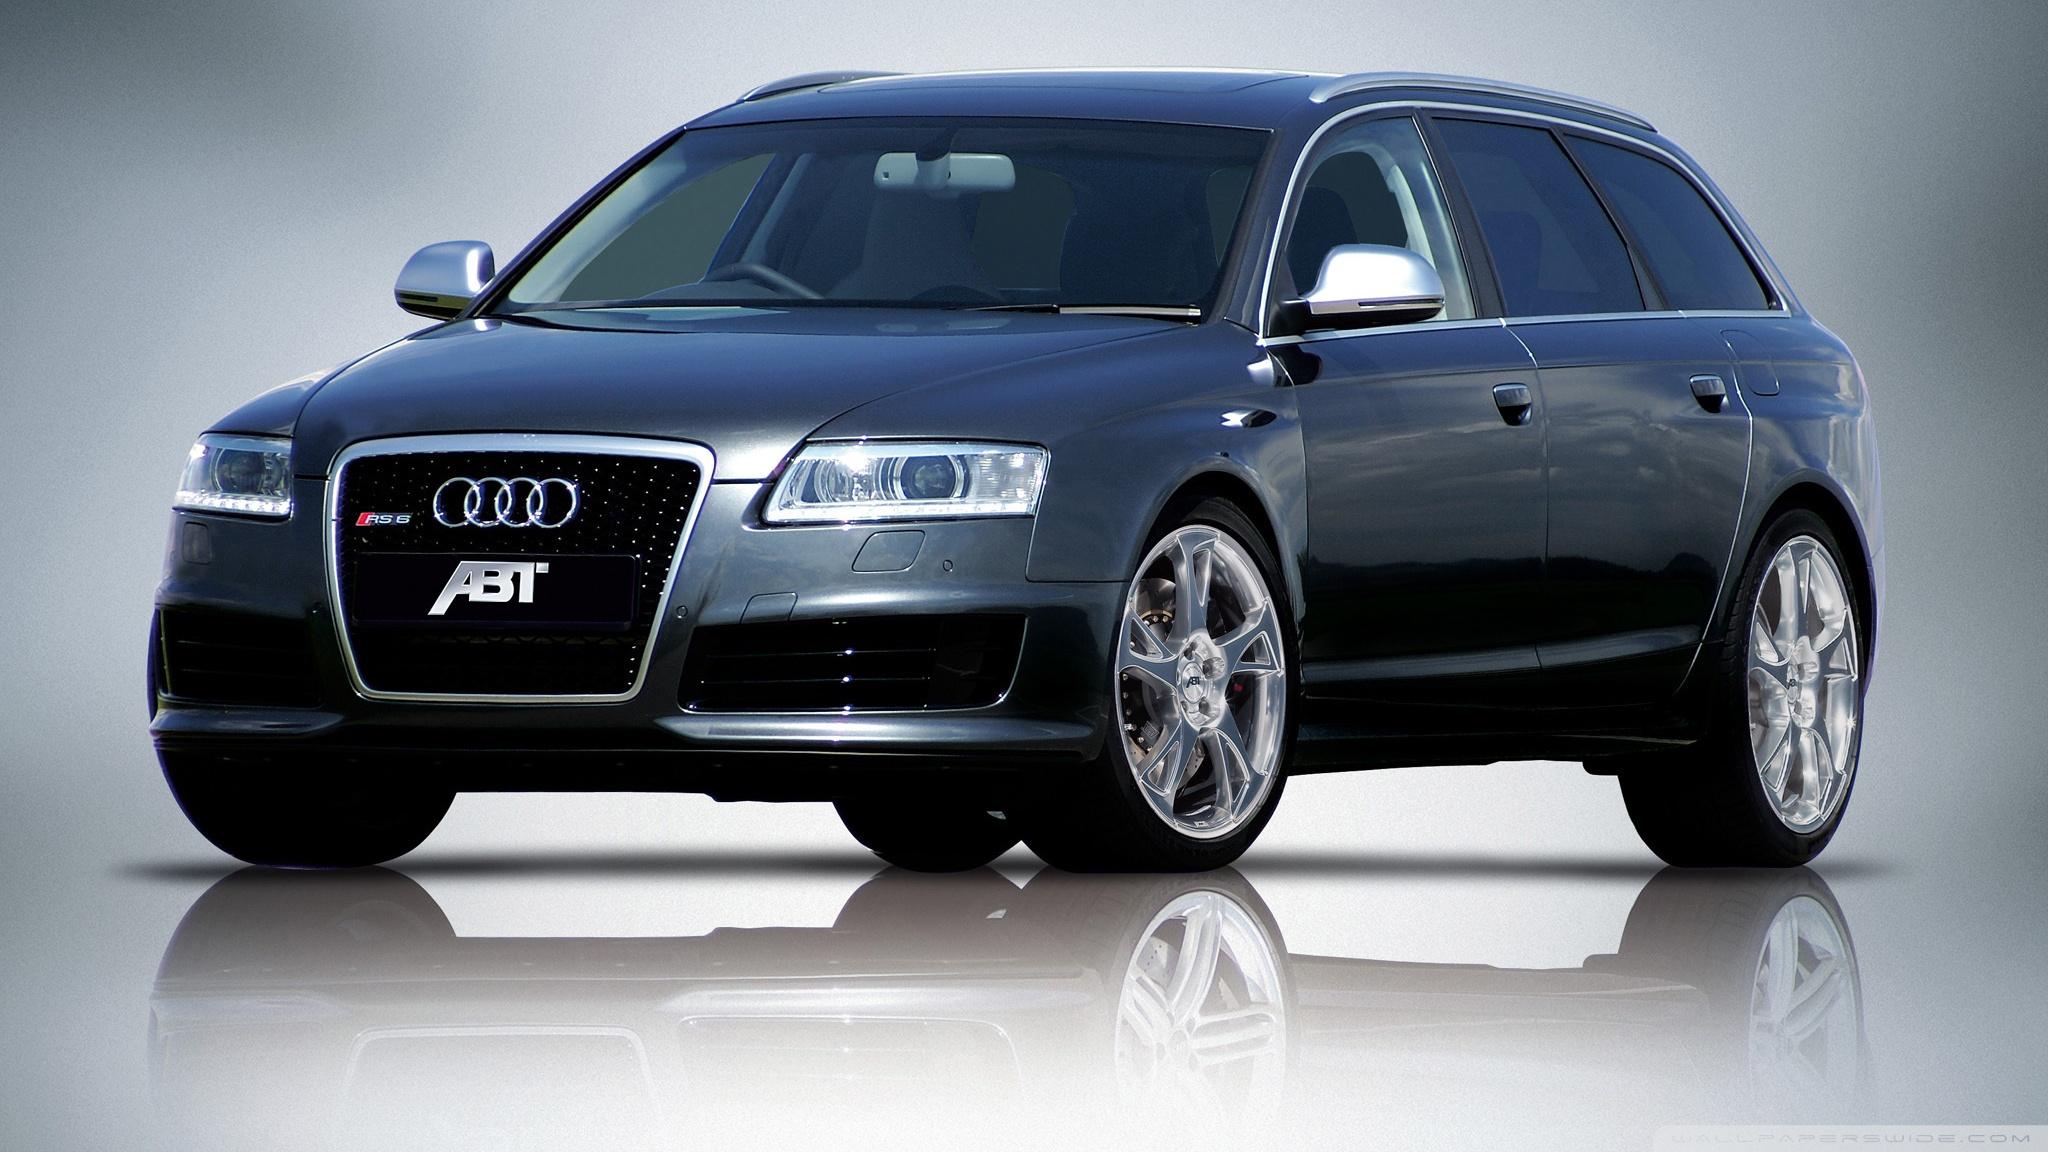 ABT Audi RS6 Avant Car 4 4K HD Desktop Wallpaper For 4K